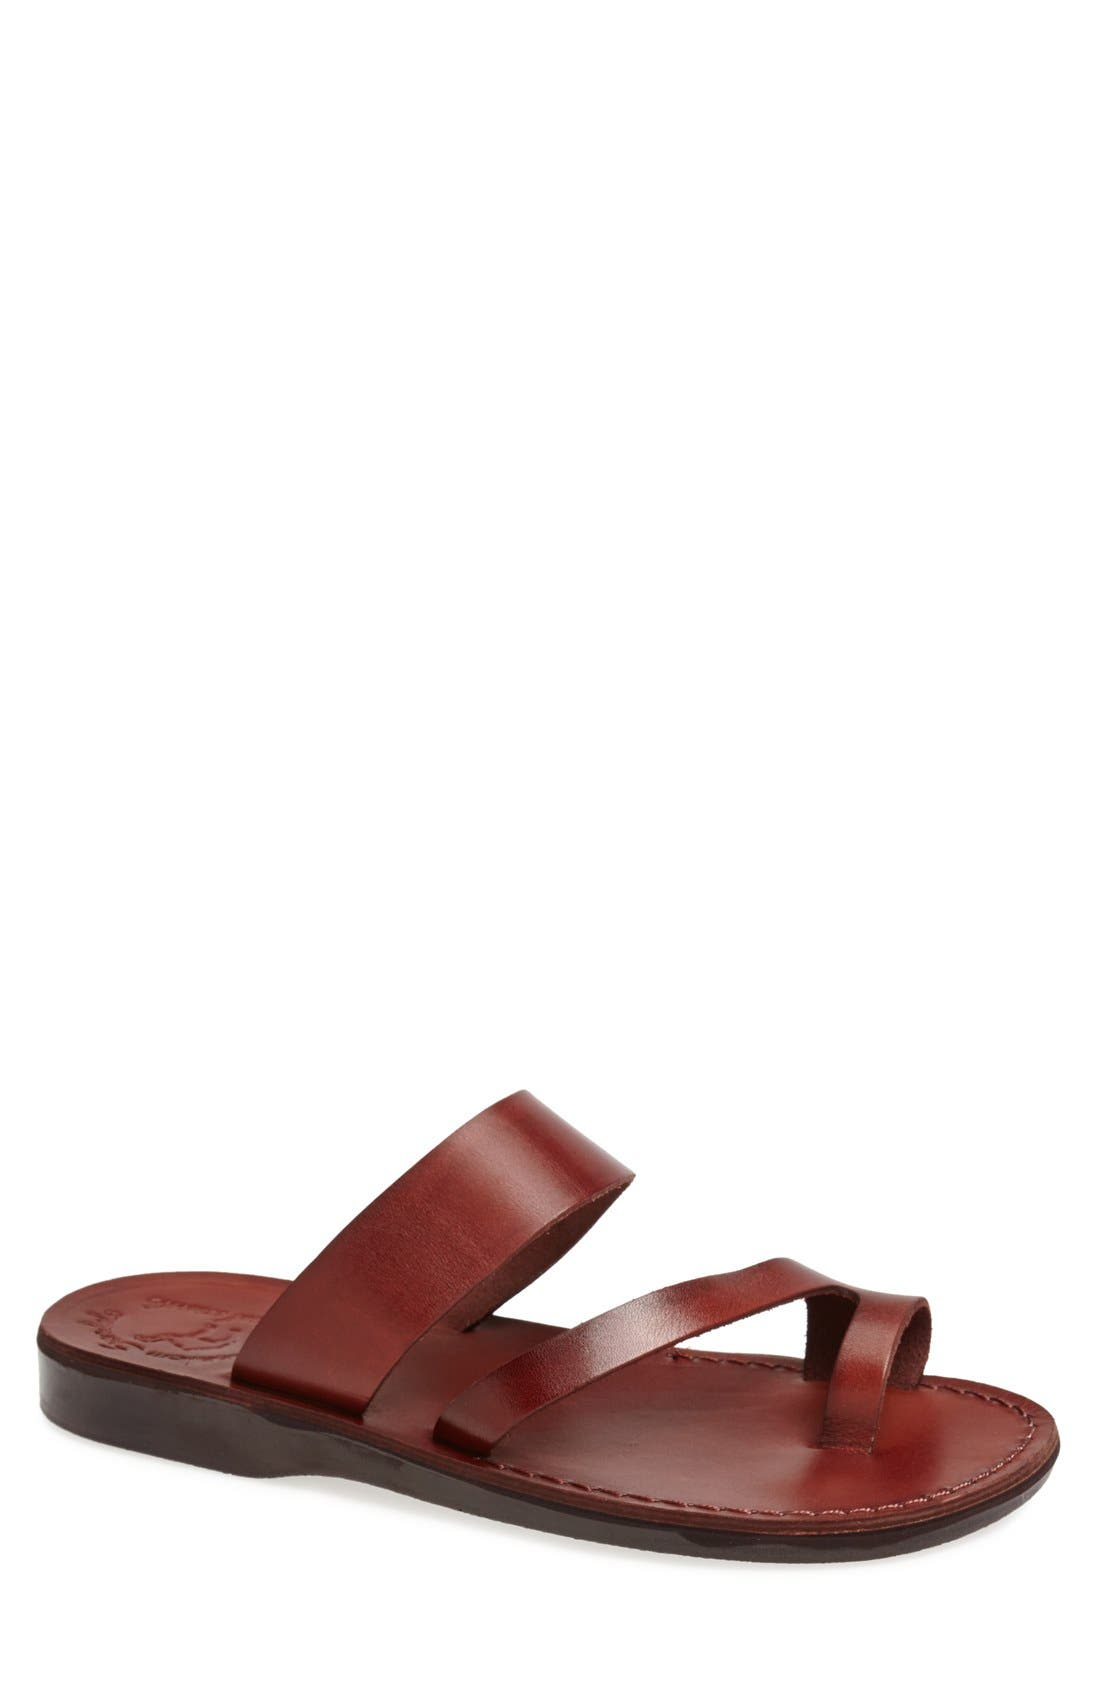 'Zohar' Leather Sandal,                             Main thumbnail 1, color,                             BROWN